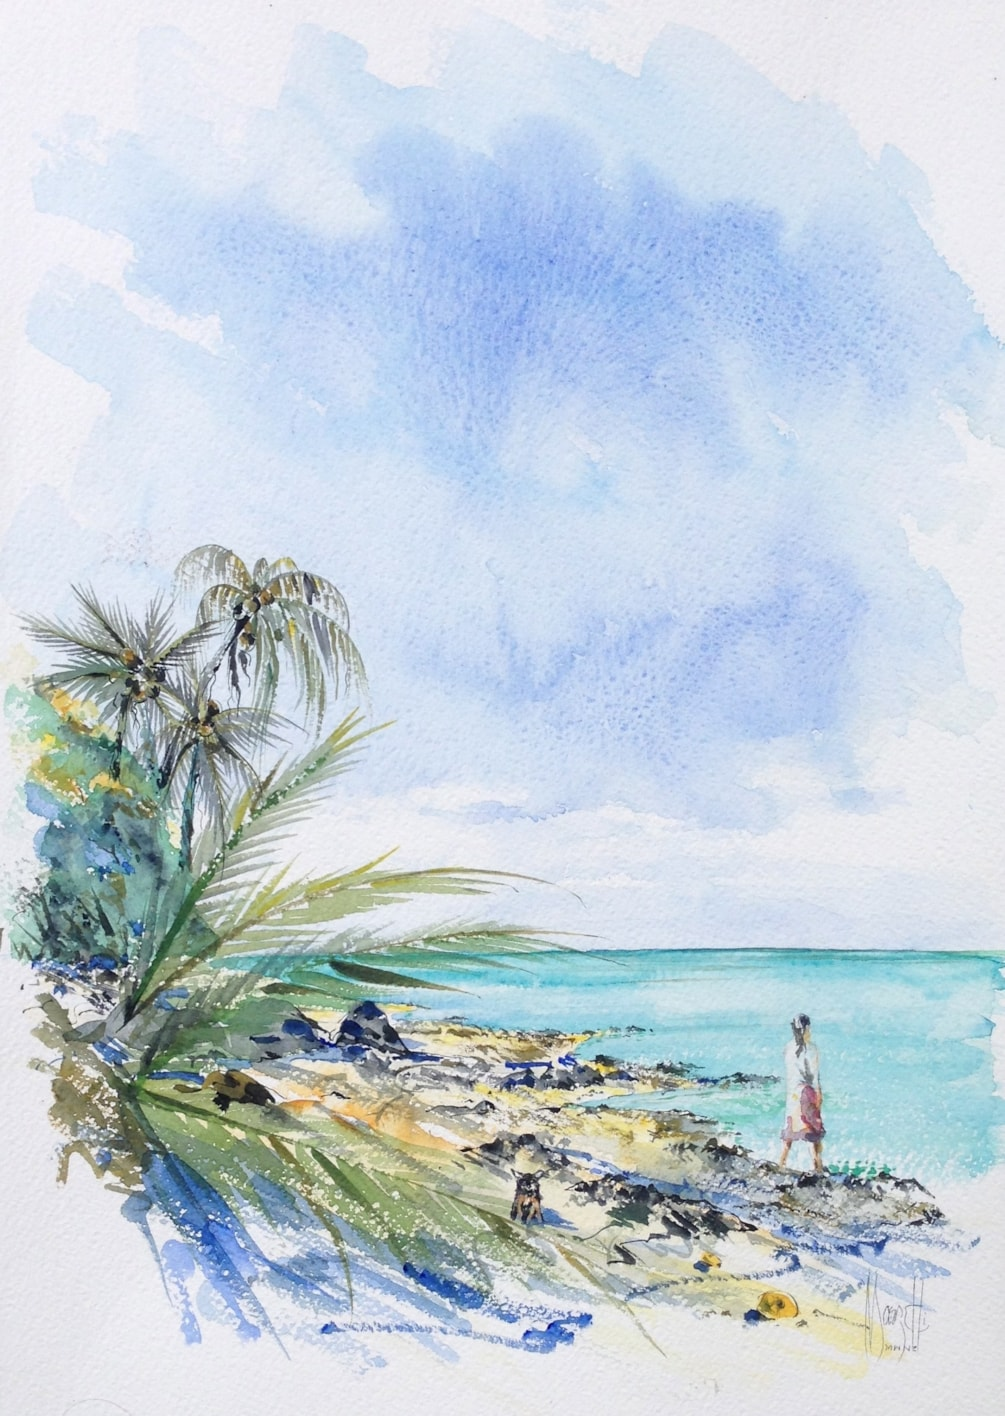 Waimaka, Cook Islands